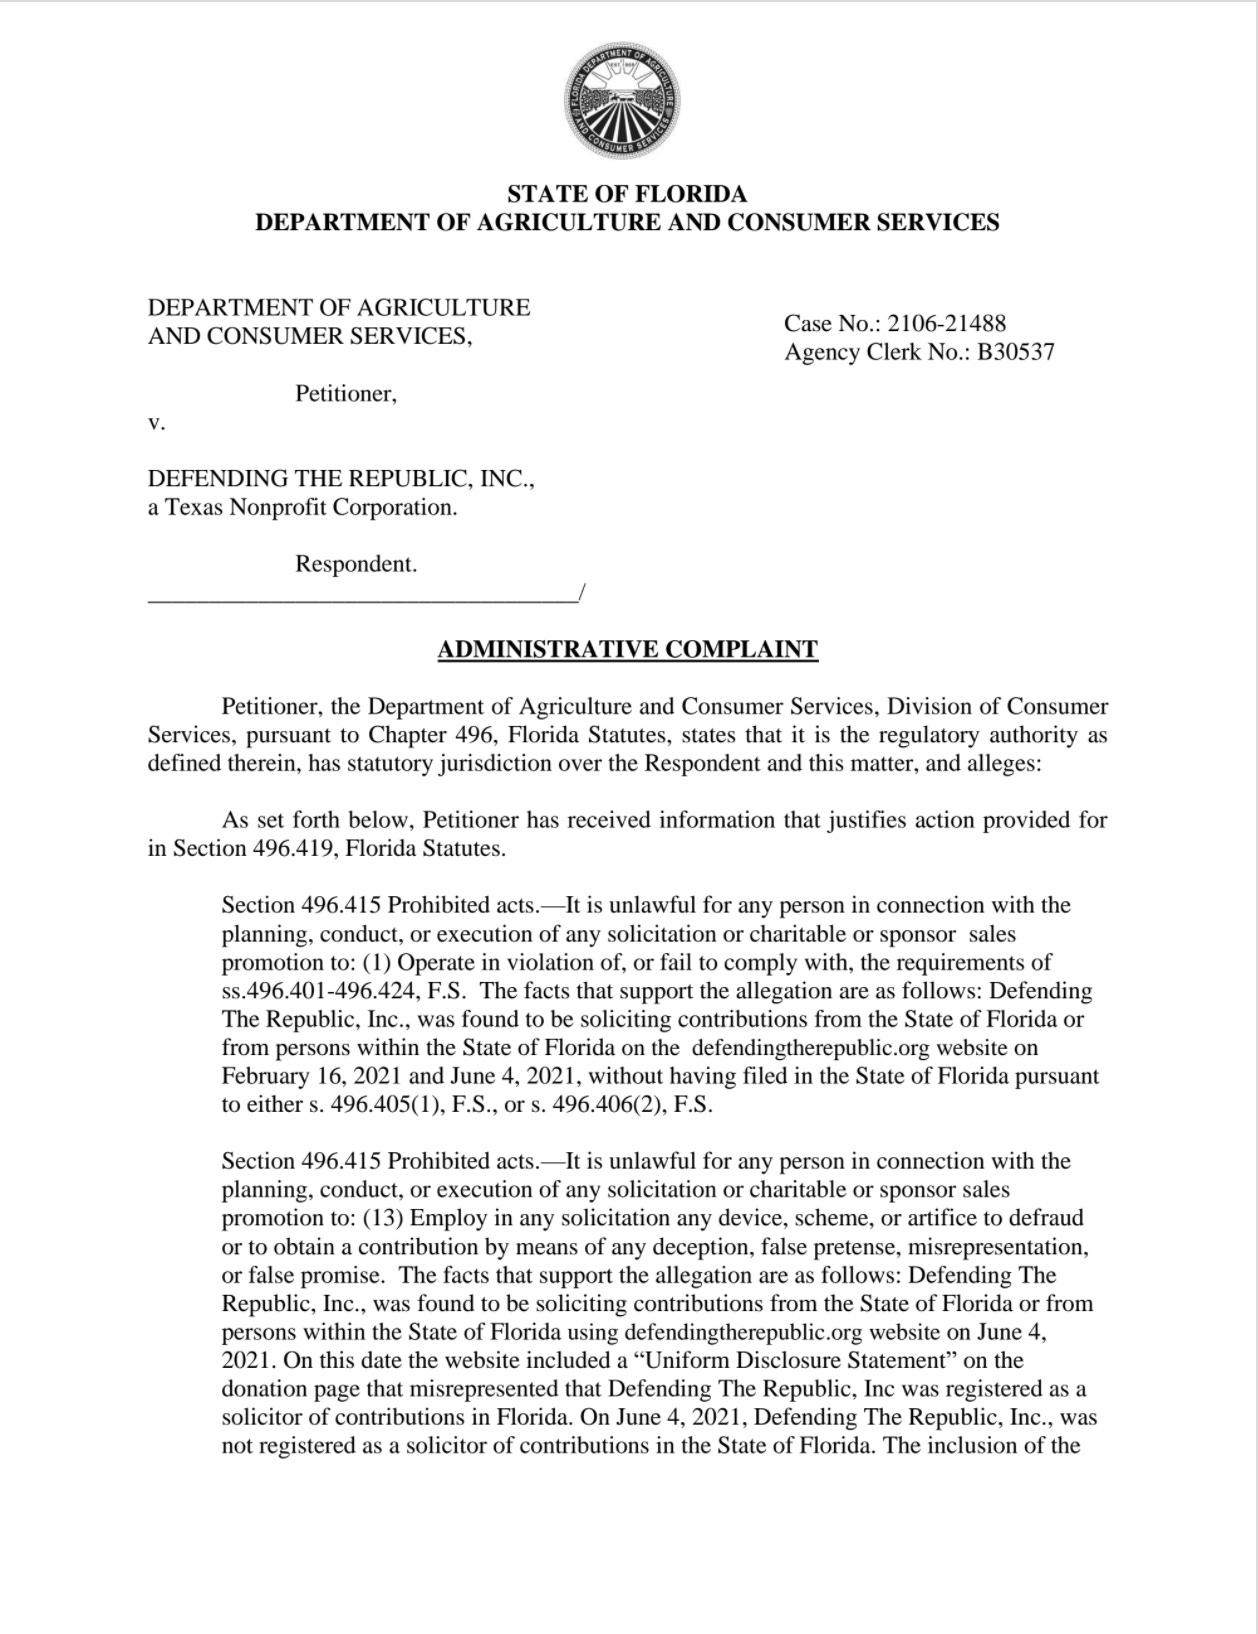 Florida complaint against Sidney Powell and Michael Flynn